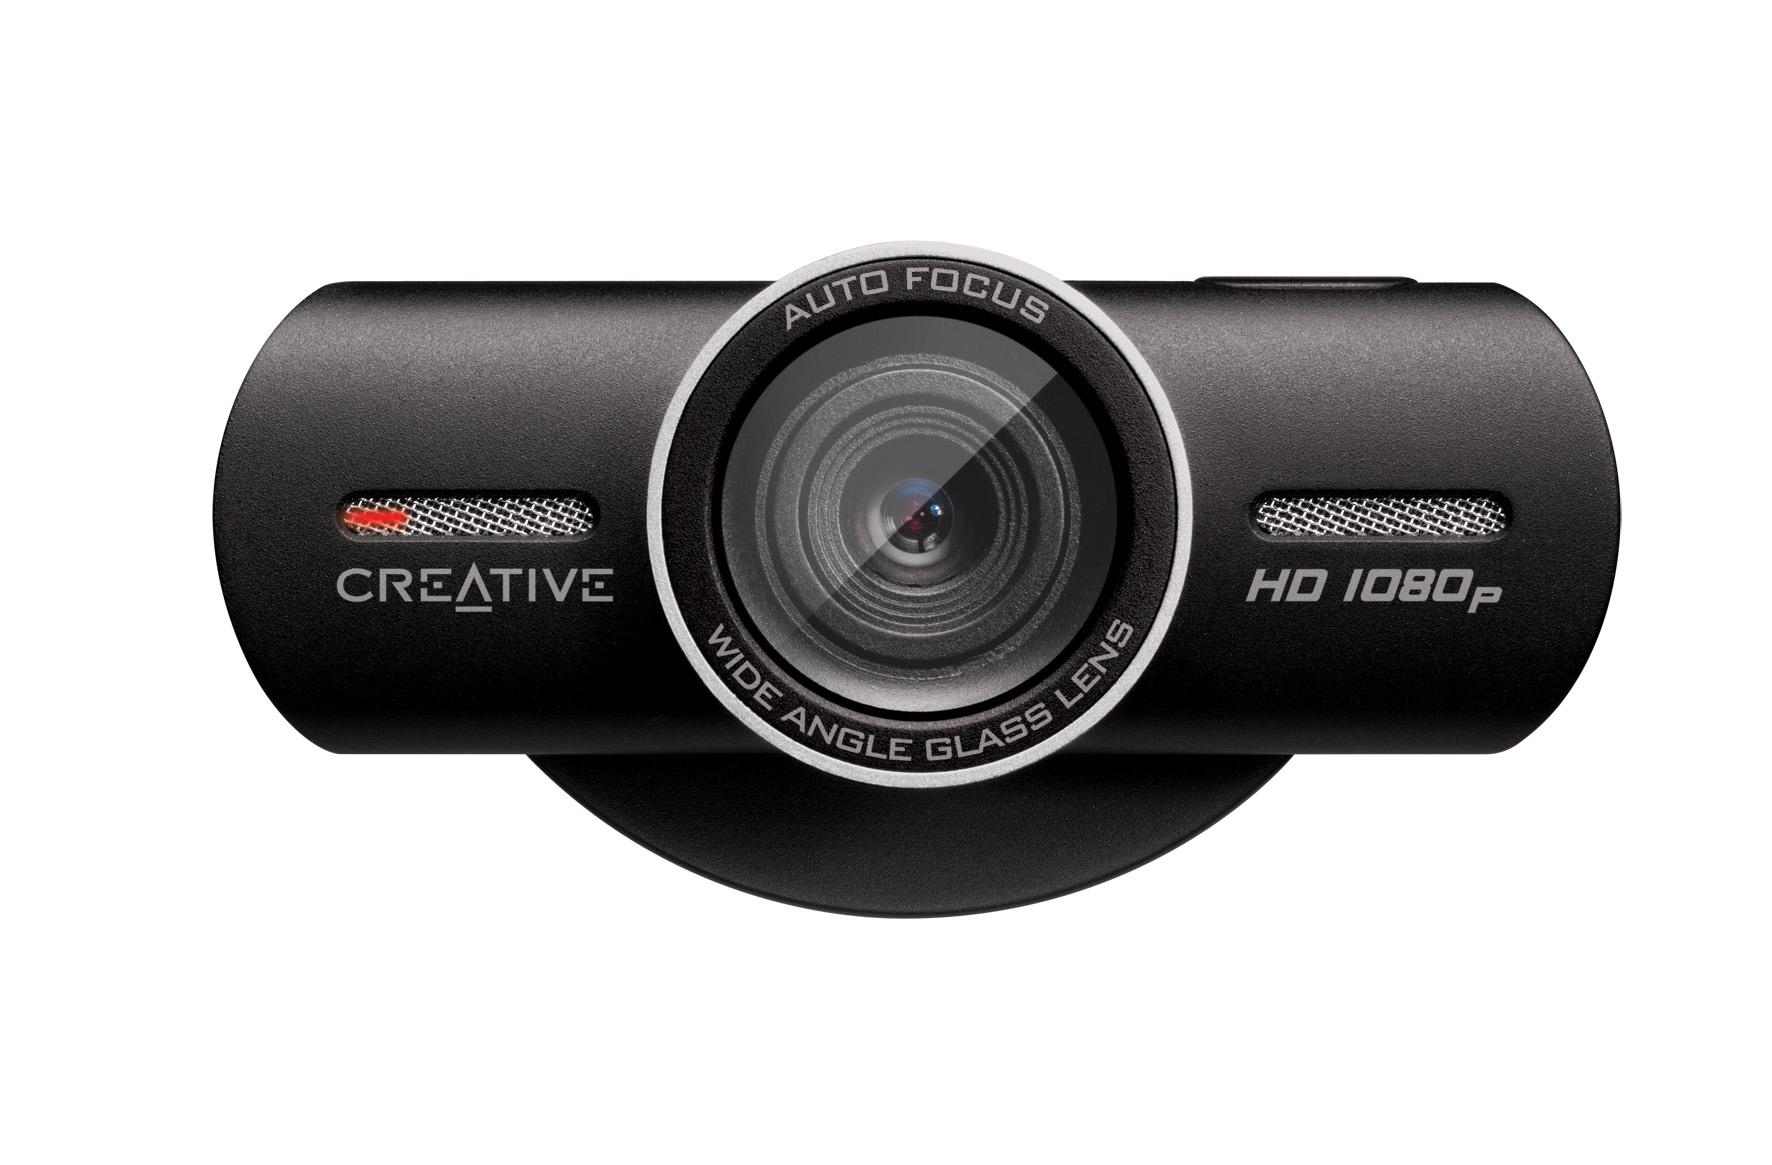 c6e0e52996b Creative Announces New Live! Cam Socialize HD 1080 Web Camera